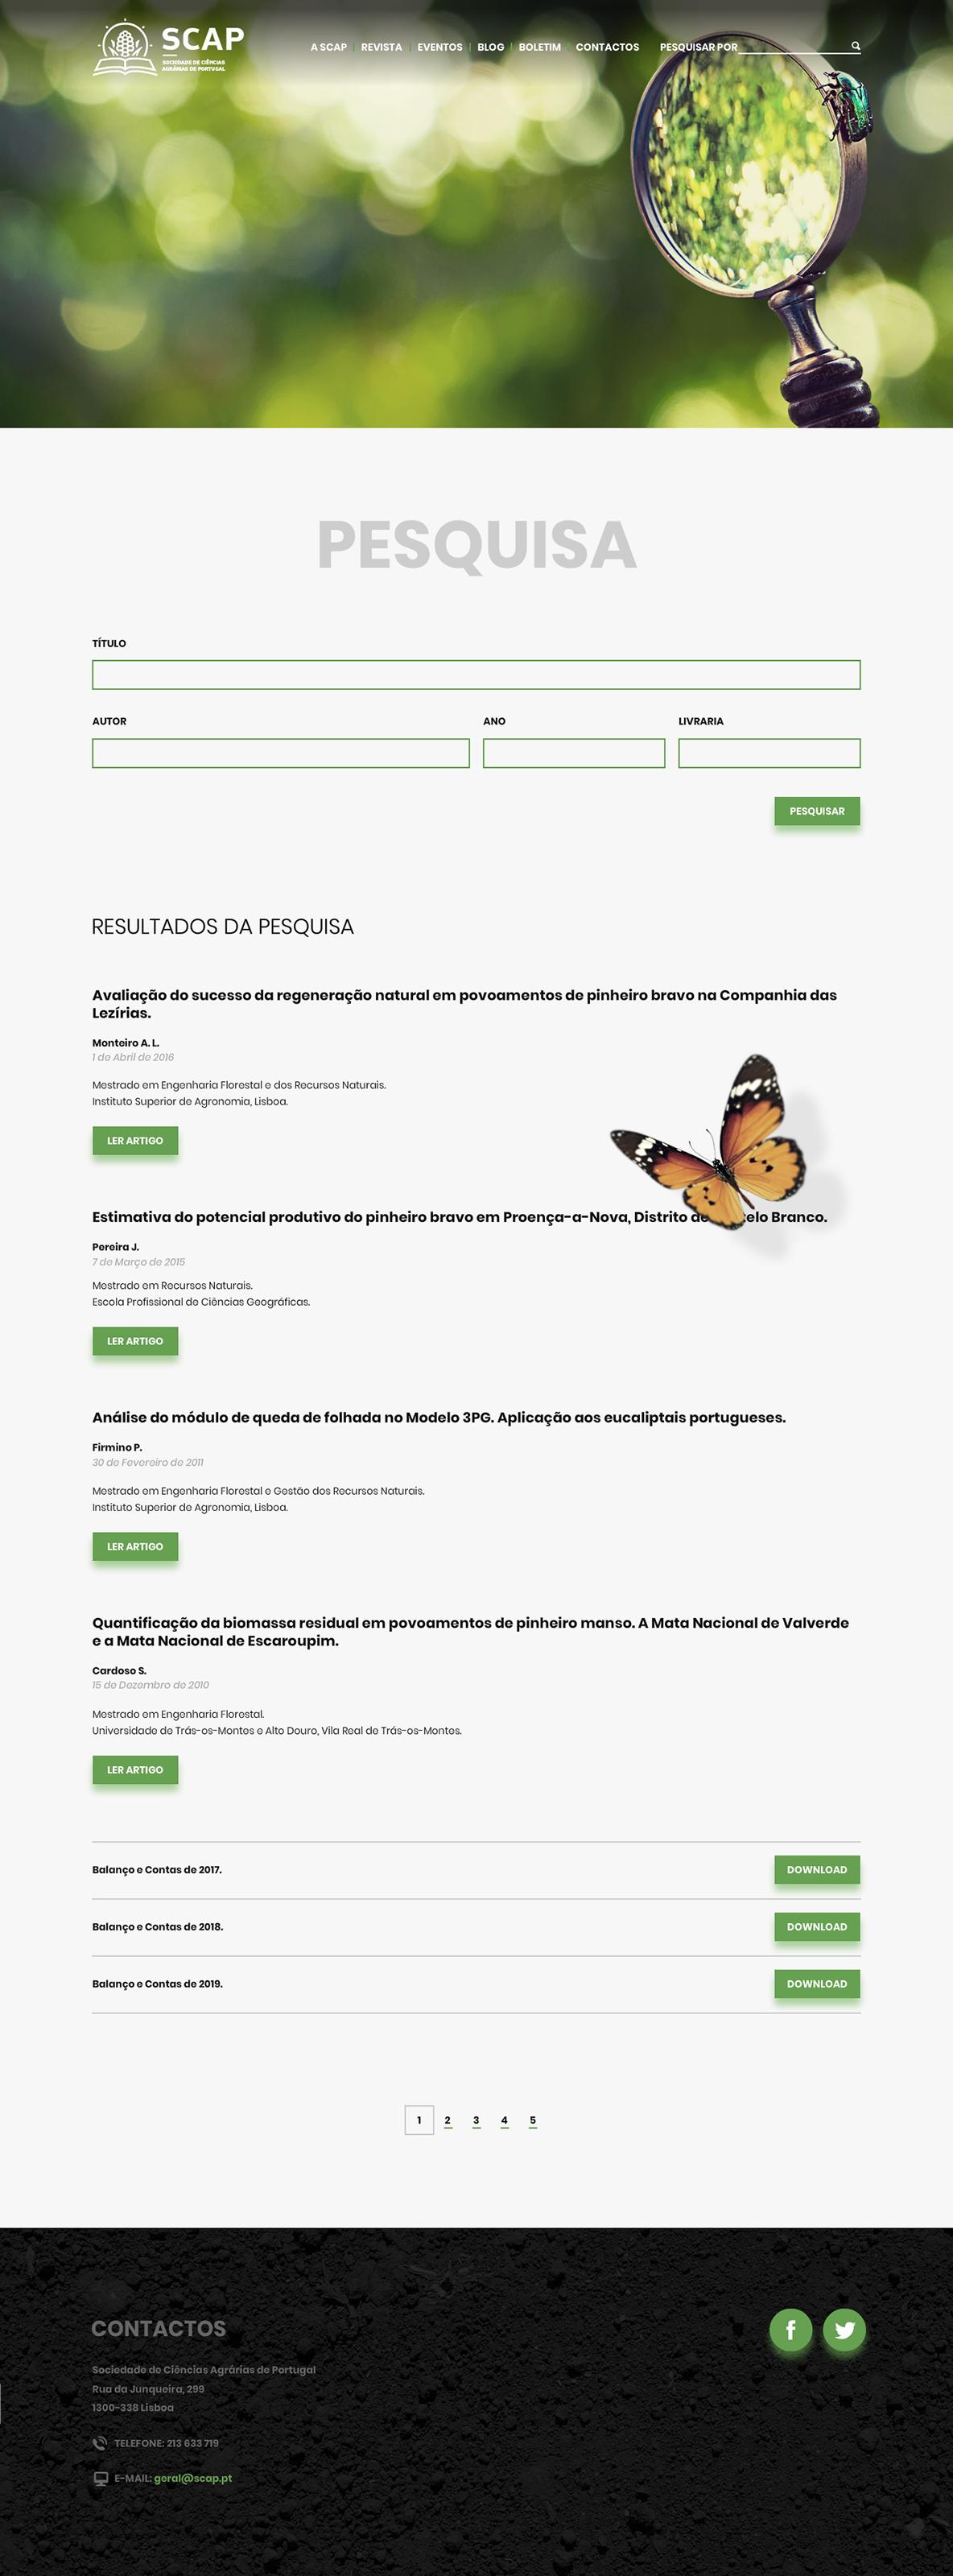 W_Web_SCAPwebsite0112SEARCH.png